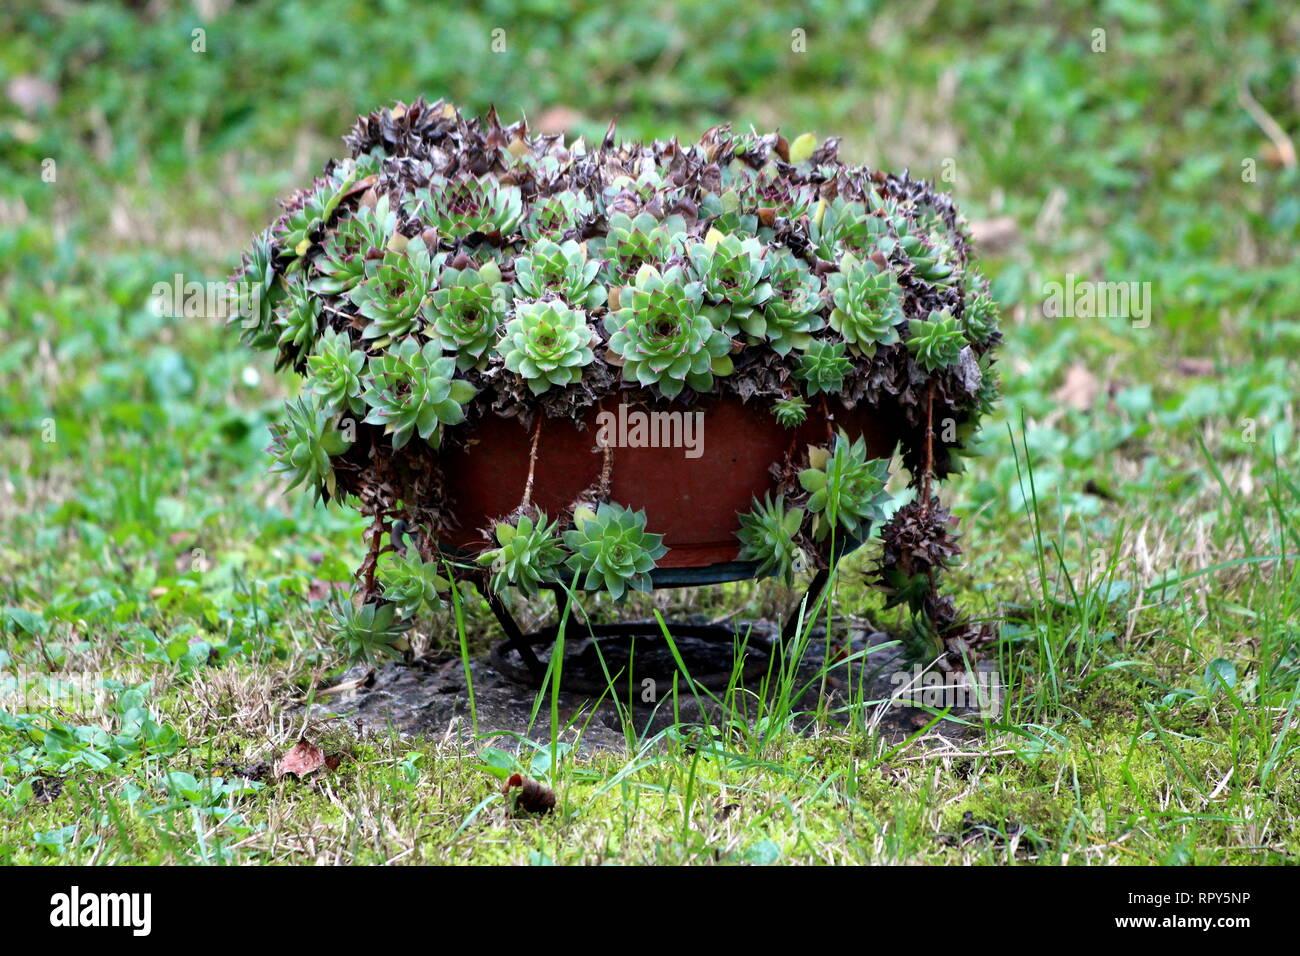 Overgrown Houseleek Or Sempervivum Or Liveforever Or Hen And